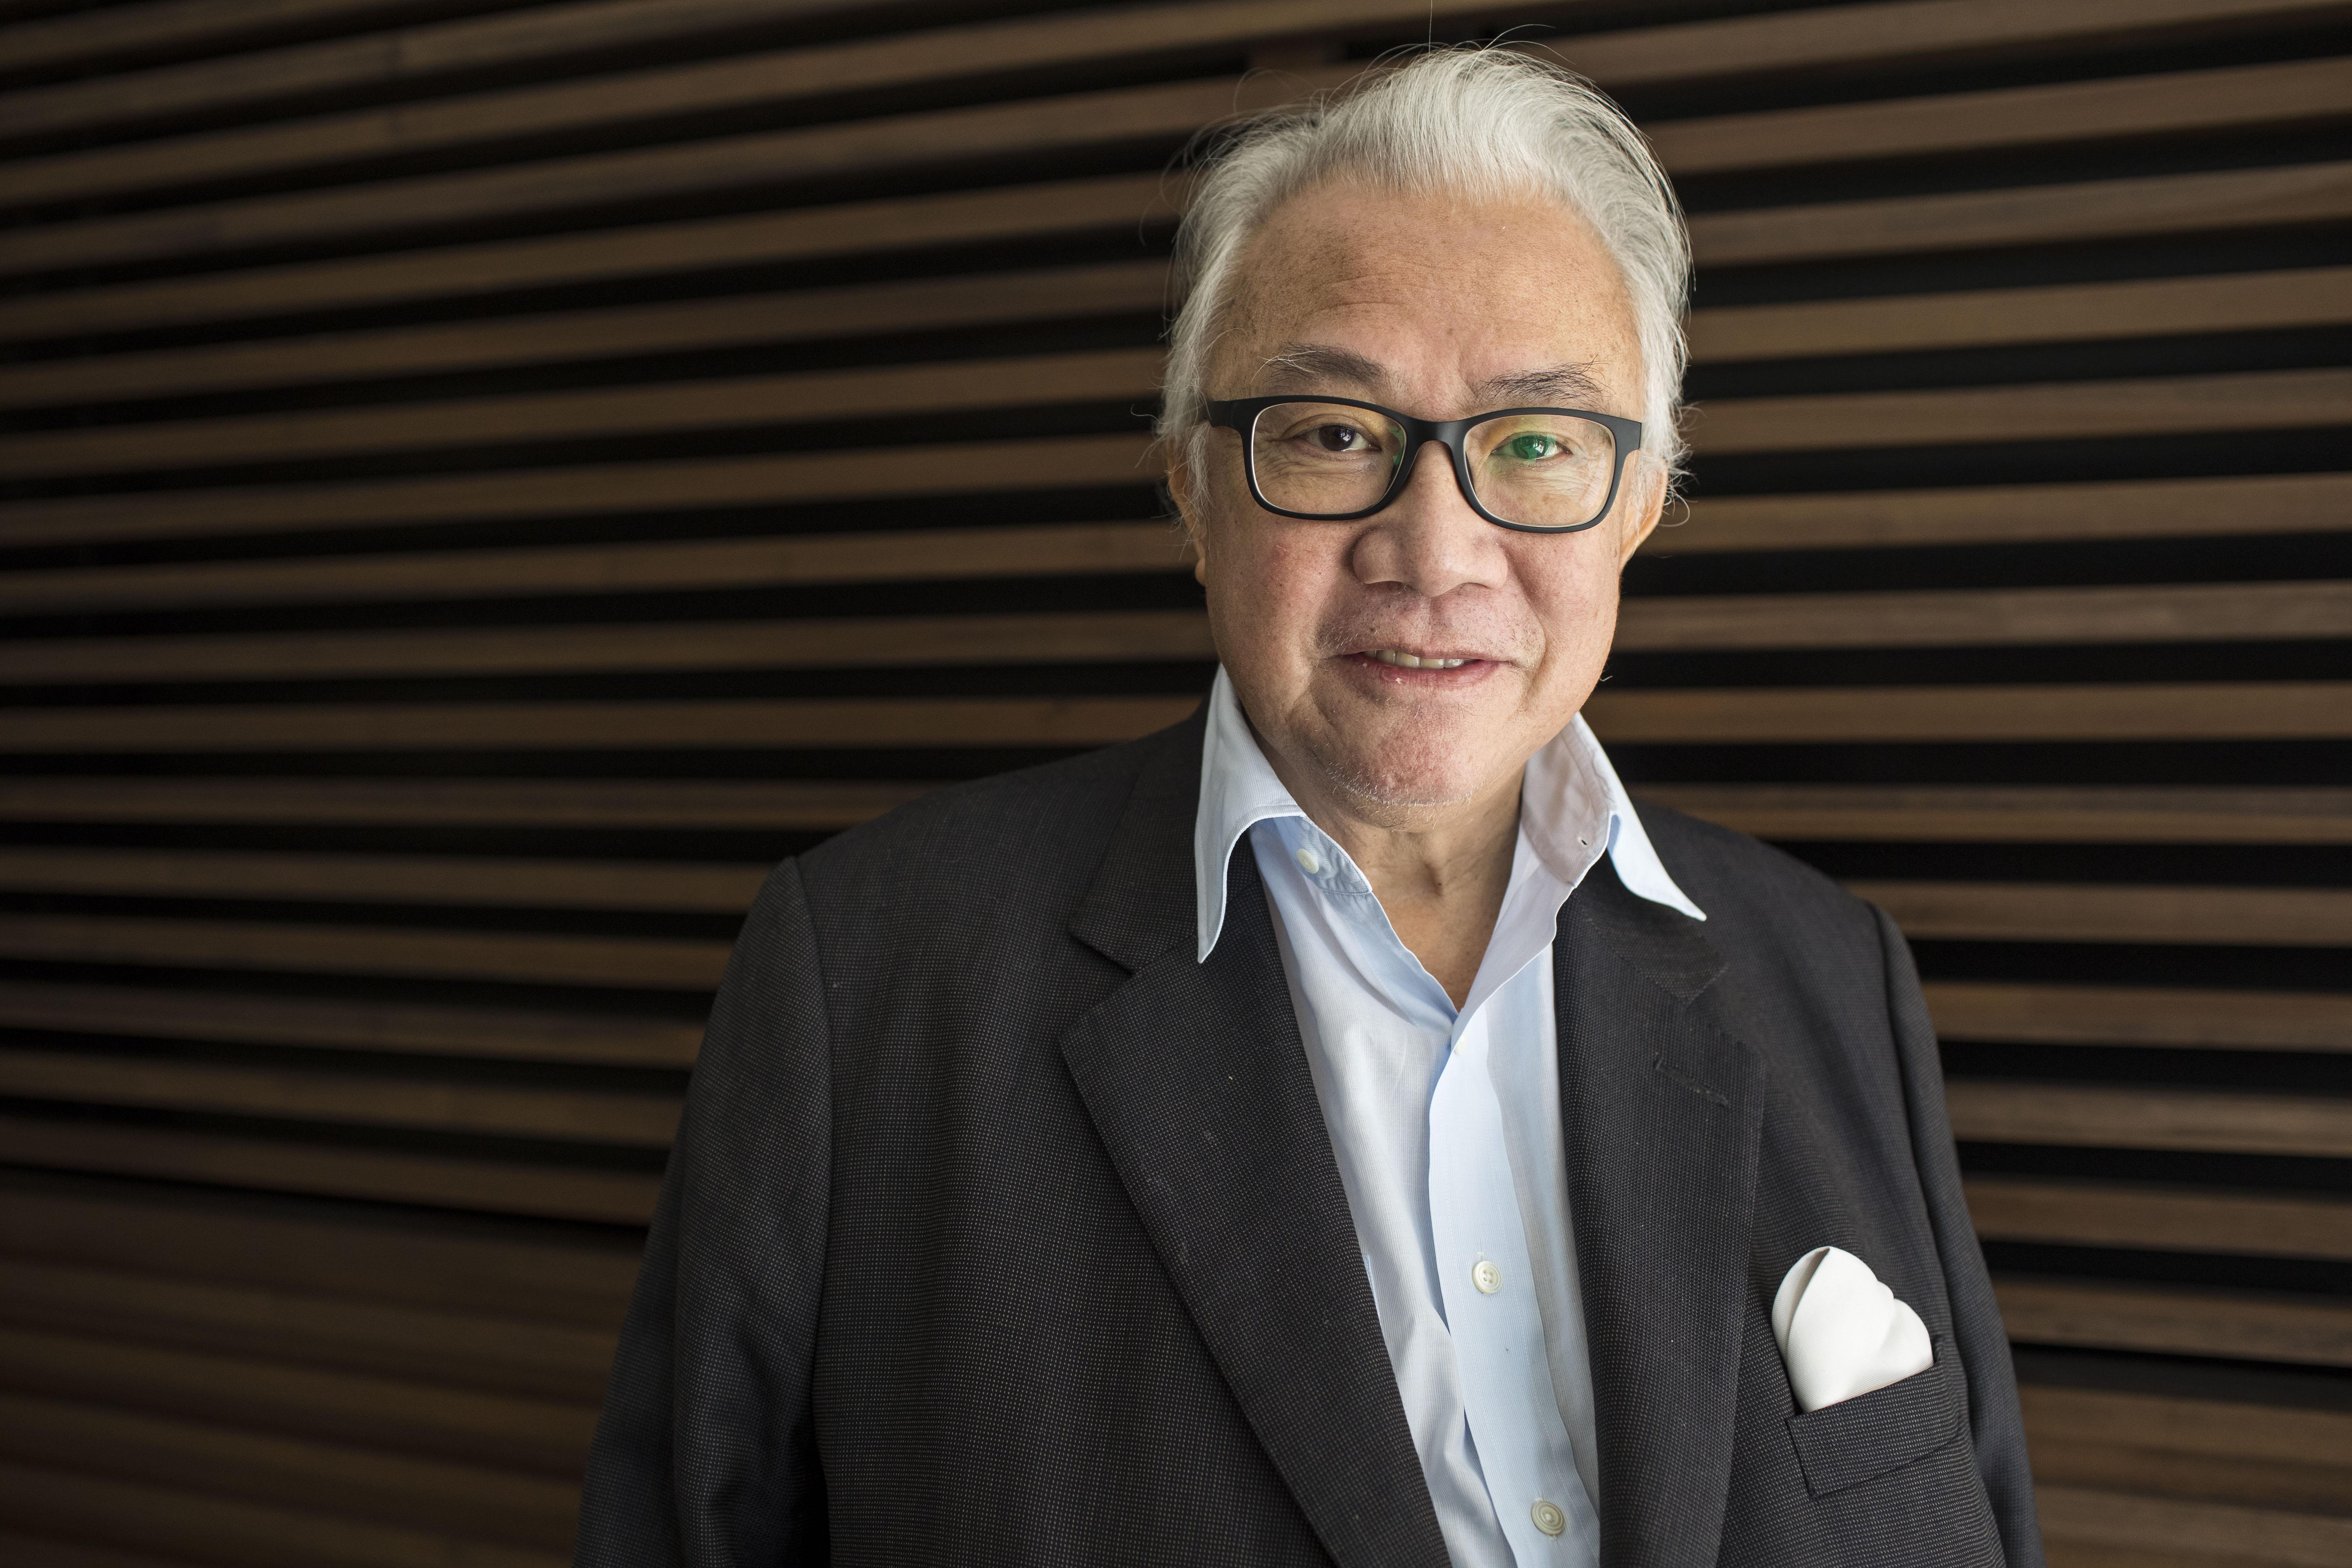 Sir David Tang, Hong Kong entrepreneur, at the FT Weekend Oxford Literary Festival on April 1, 2017 in Oxford, England.